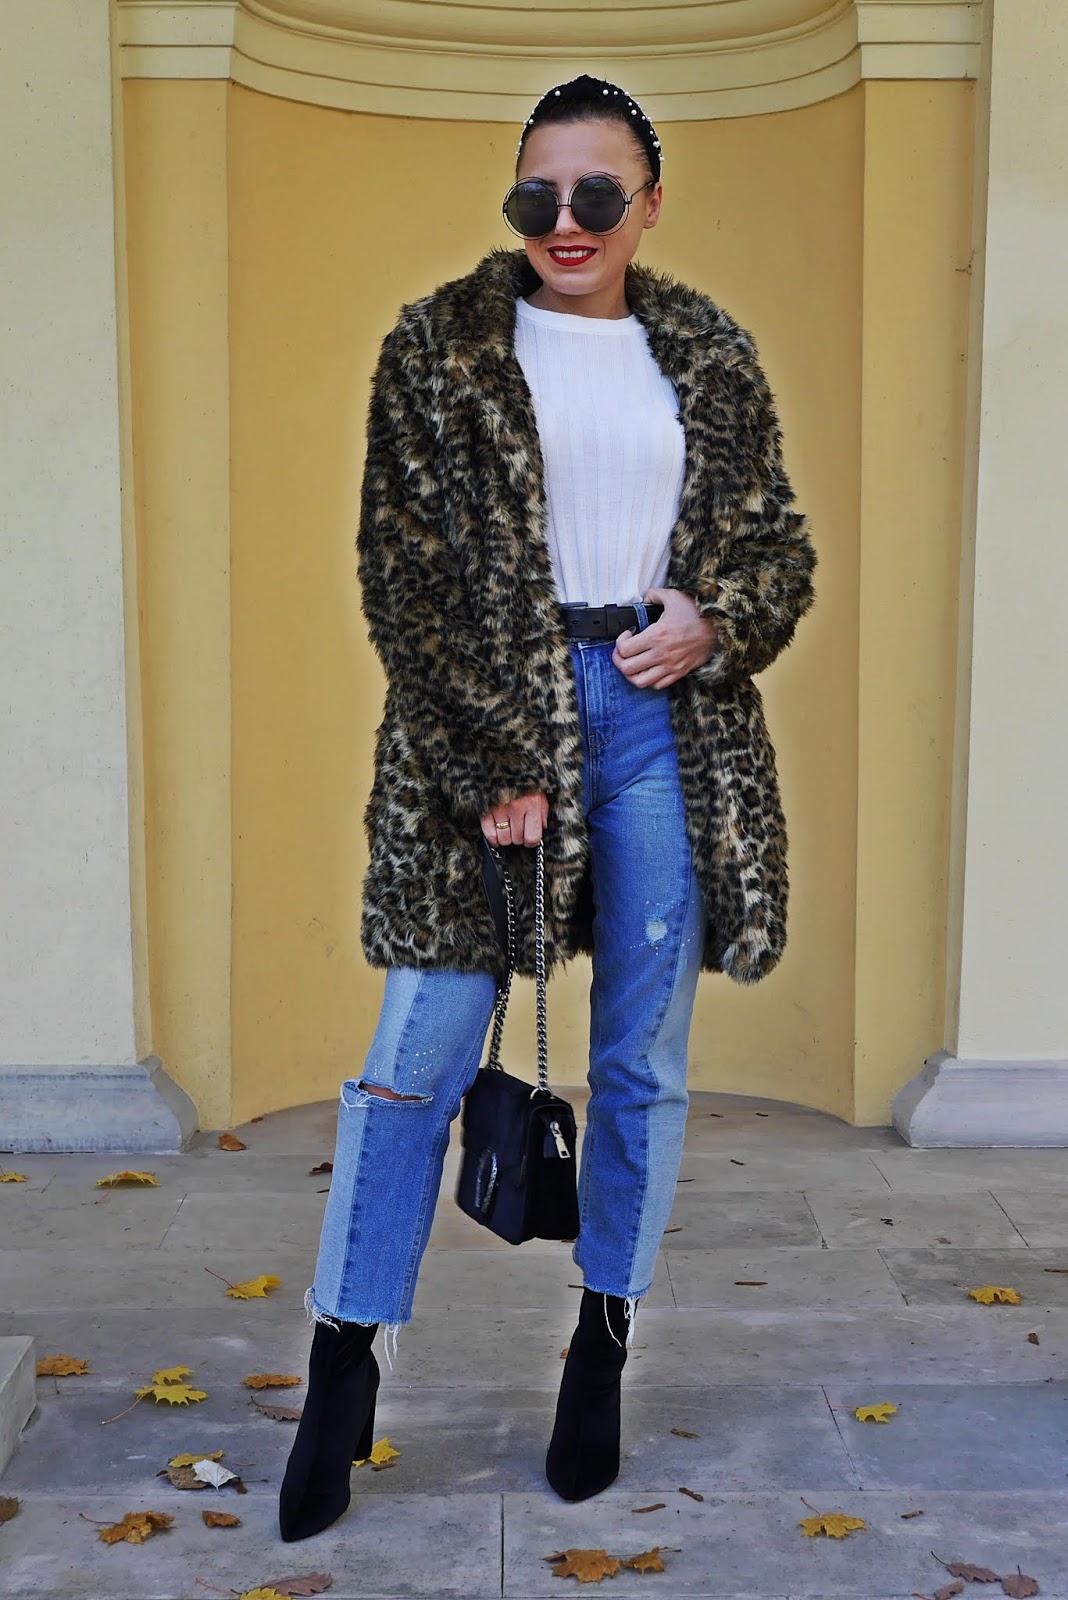 leopard print fur new look denim pants socks shoes velvet bag sunglasses hair bande aliexpress karyn fashion blogger